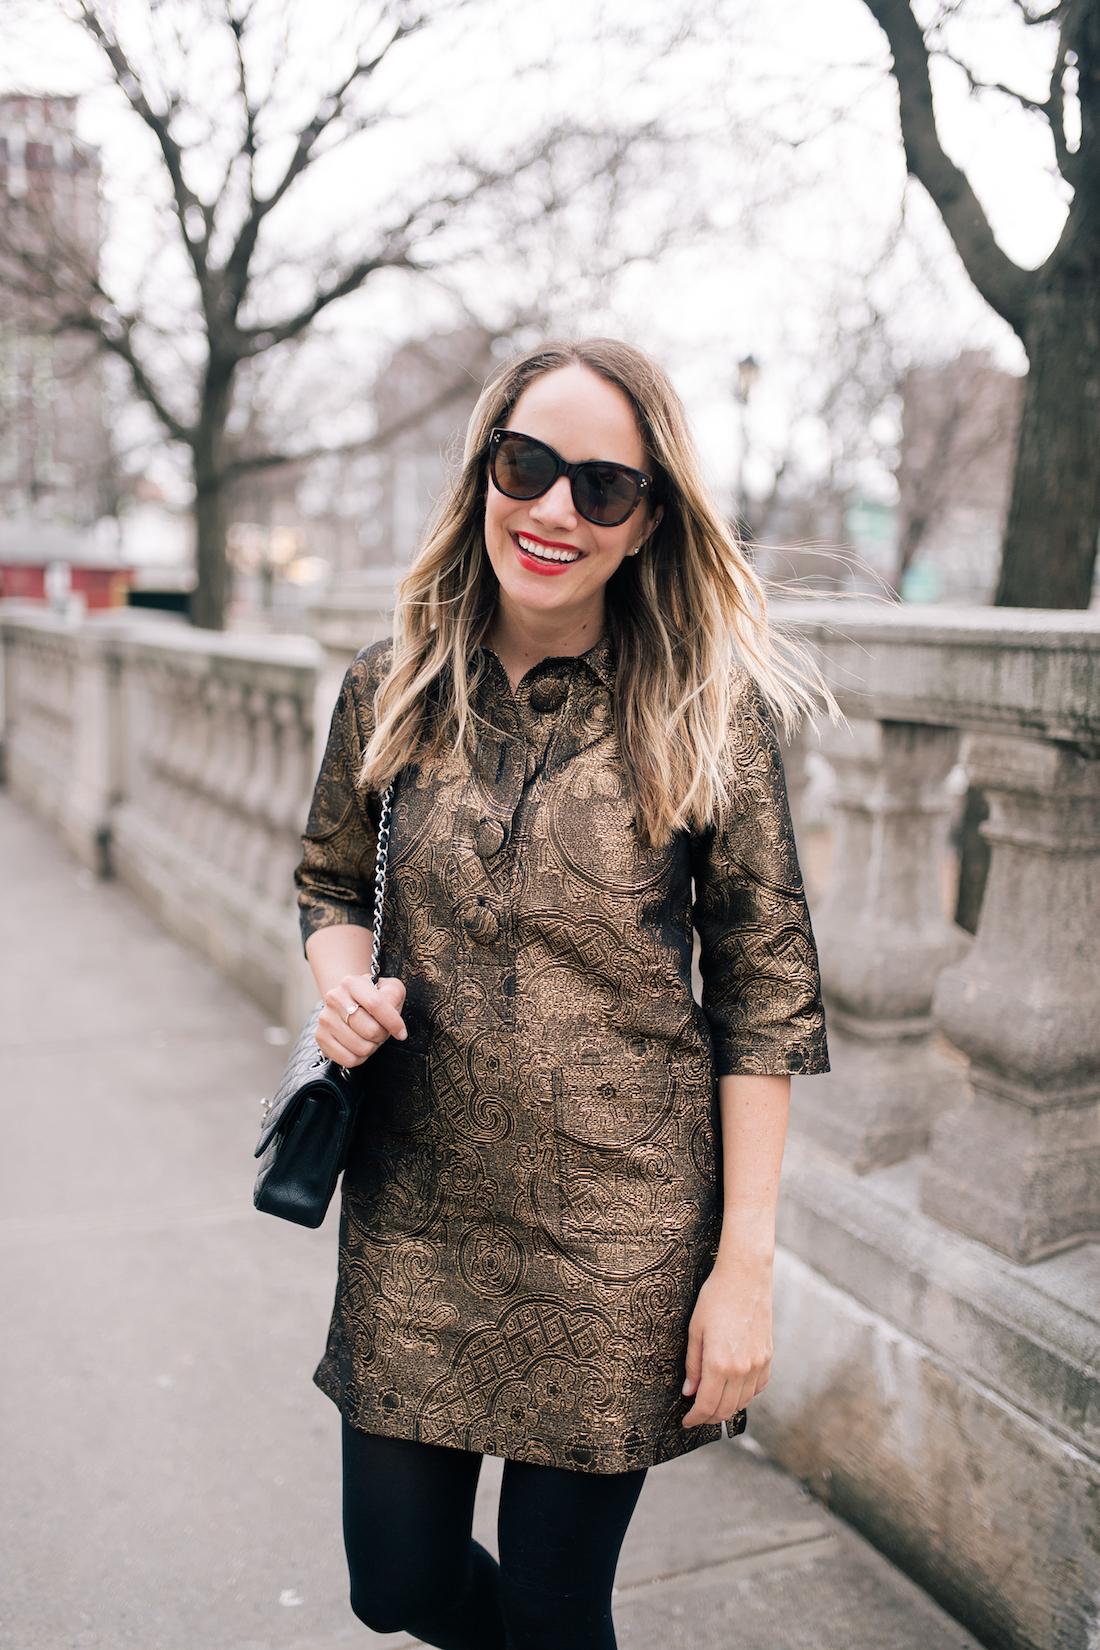 The SIL - Stuff I Like dress